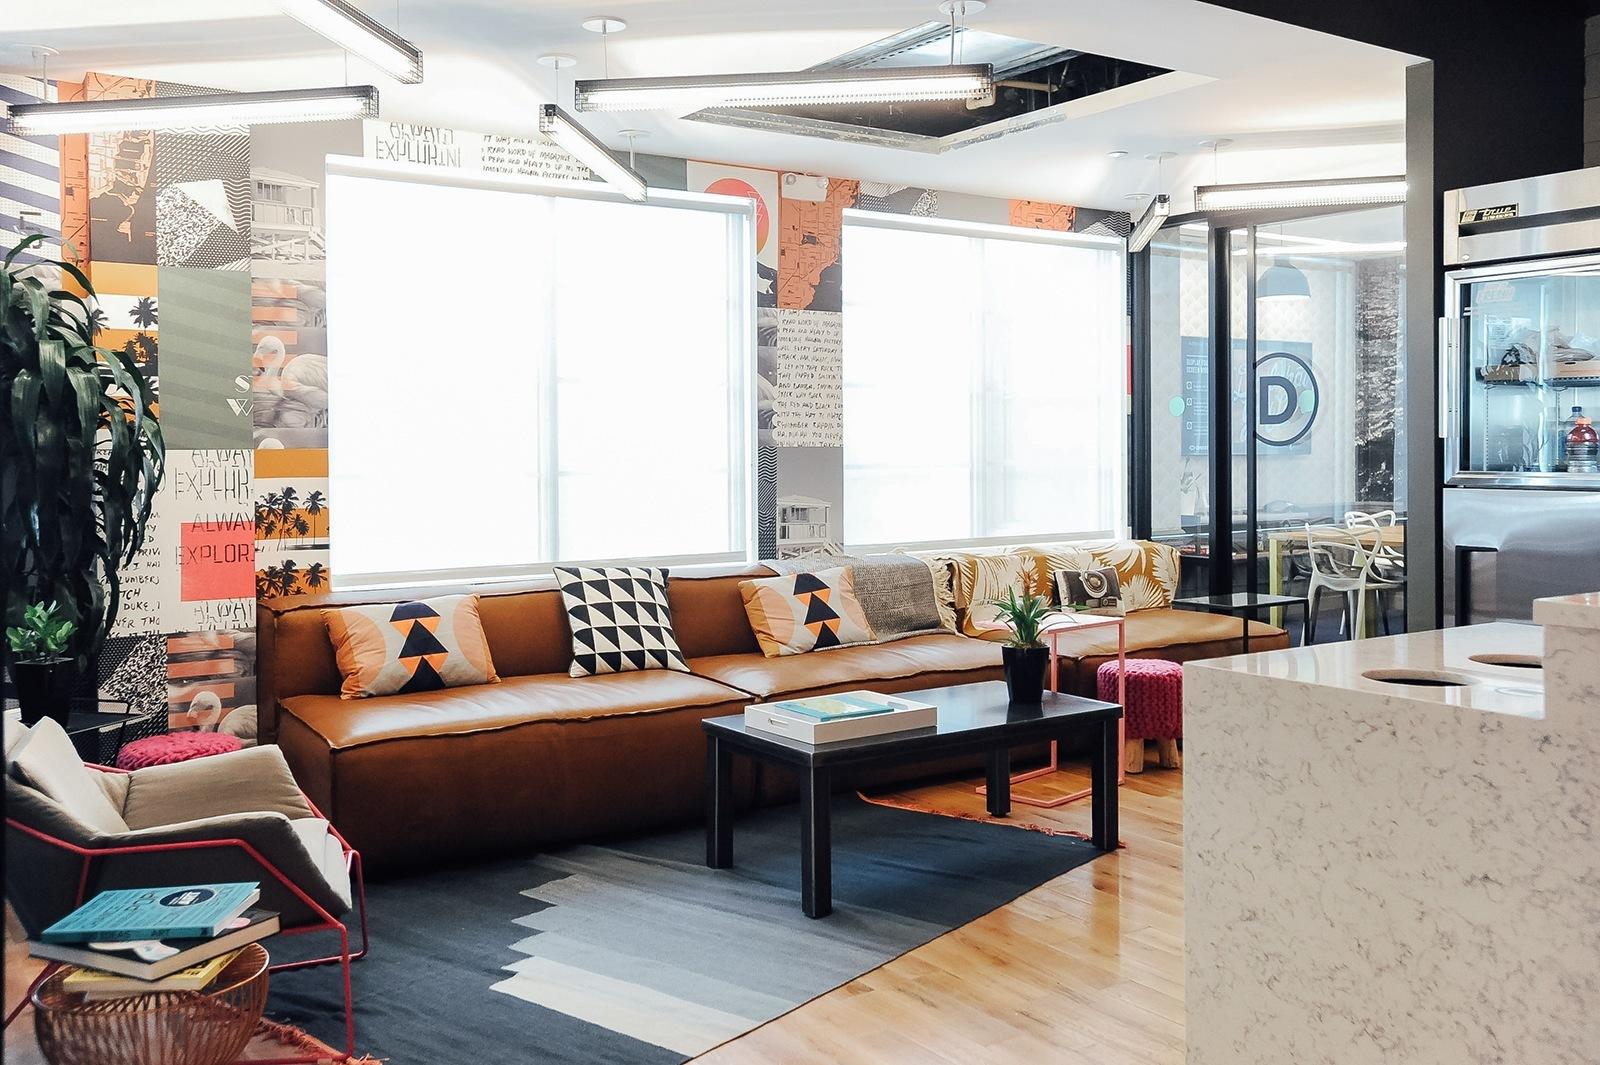 A Tour Of Wework Miami Officelovin